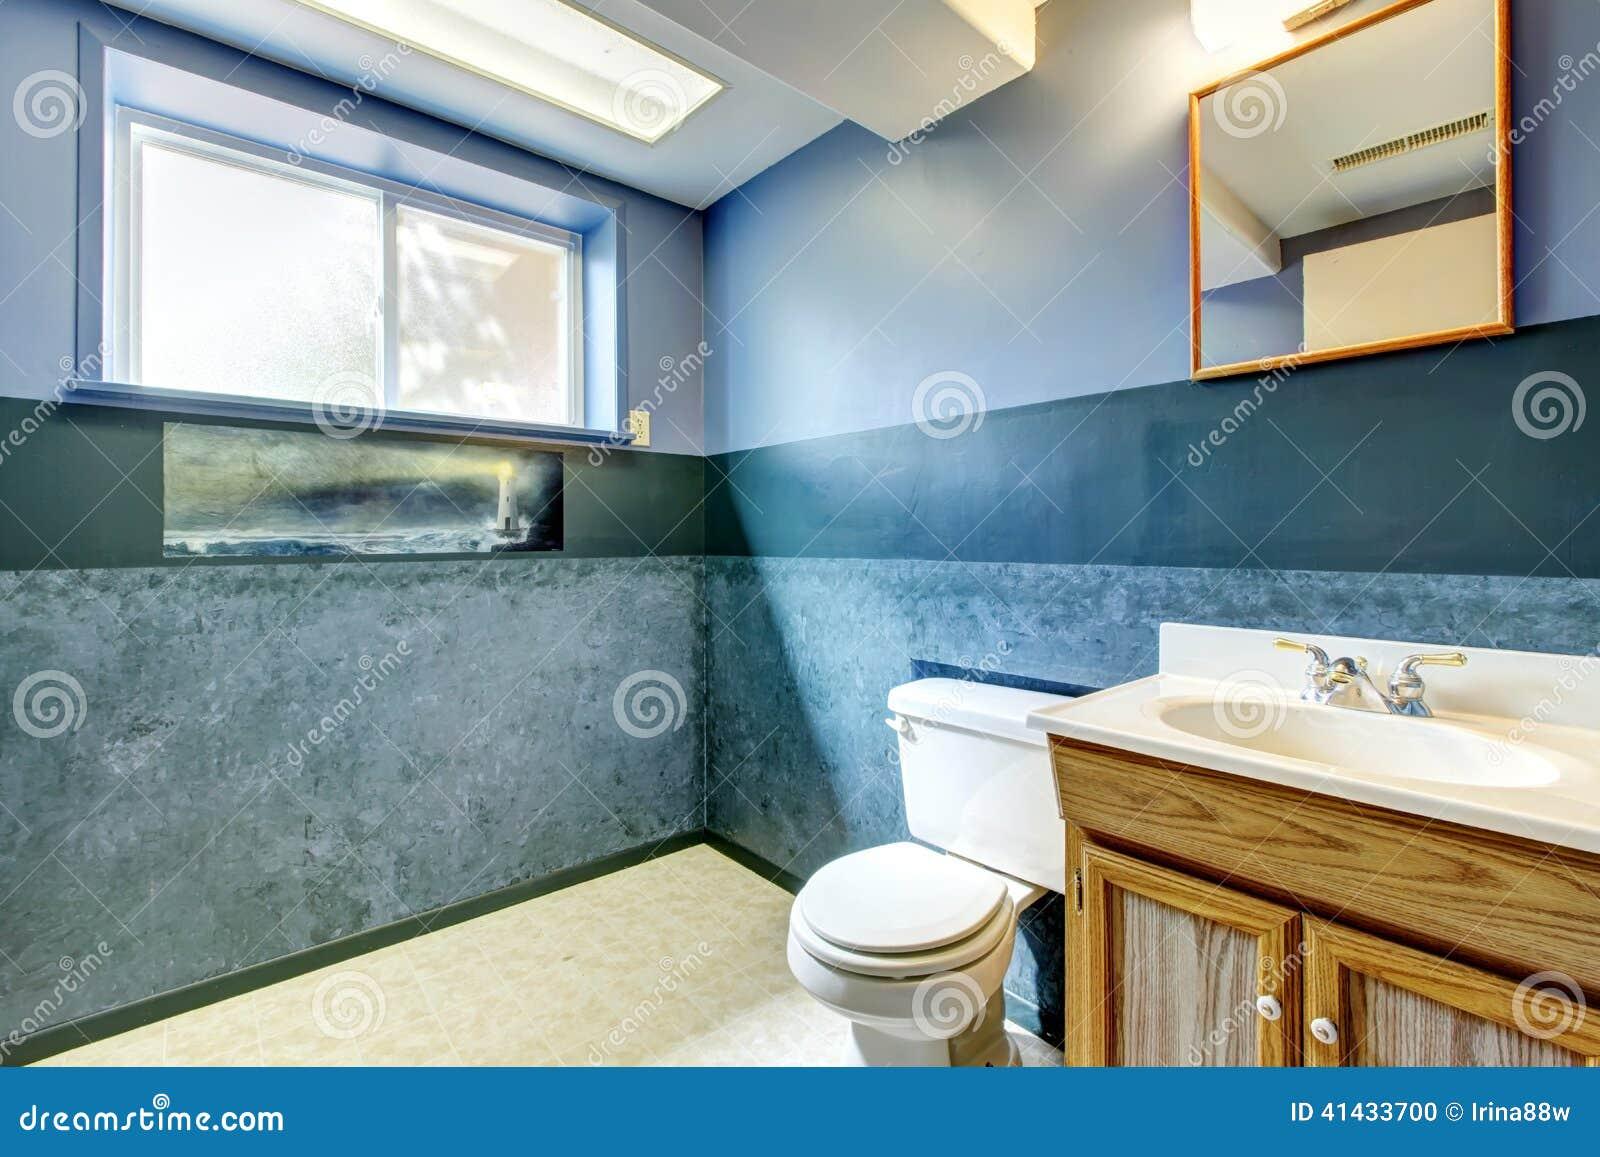 navy empty bathroom stock photo image of idea building 41433700. Black Bedroom Furniture Sets. Home Design Ideas